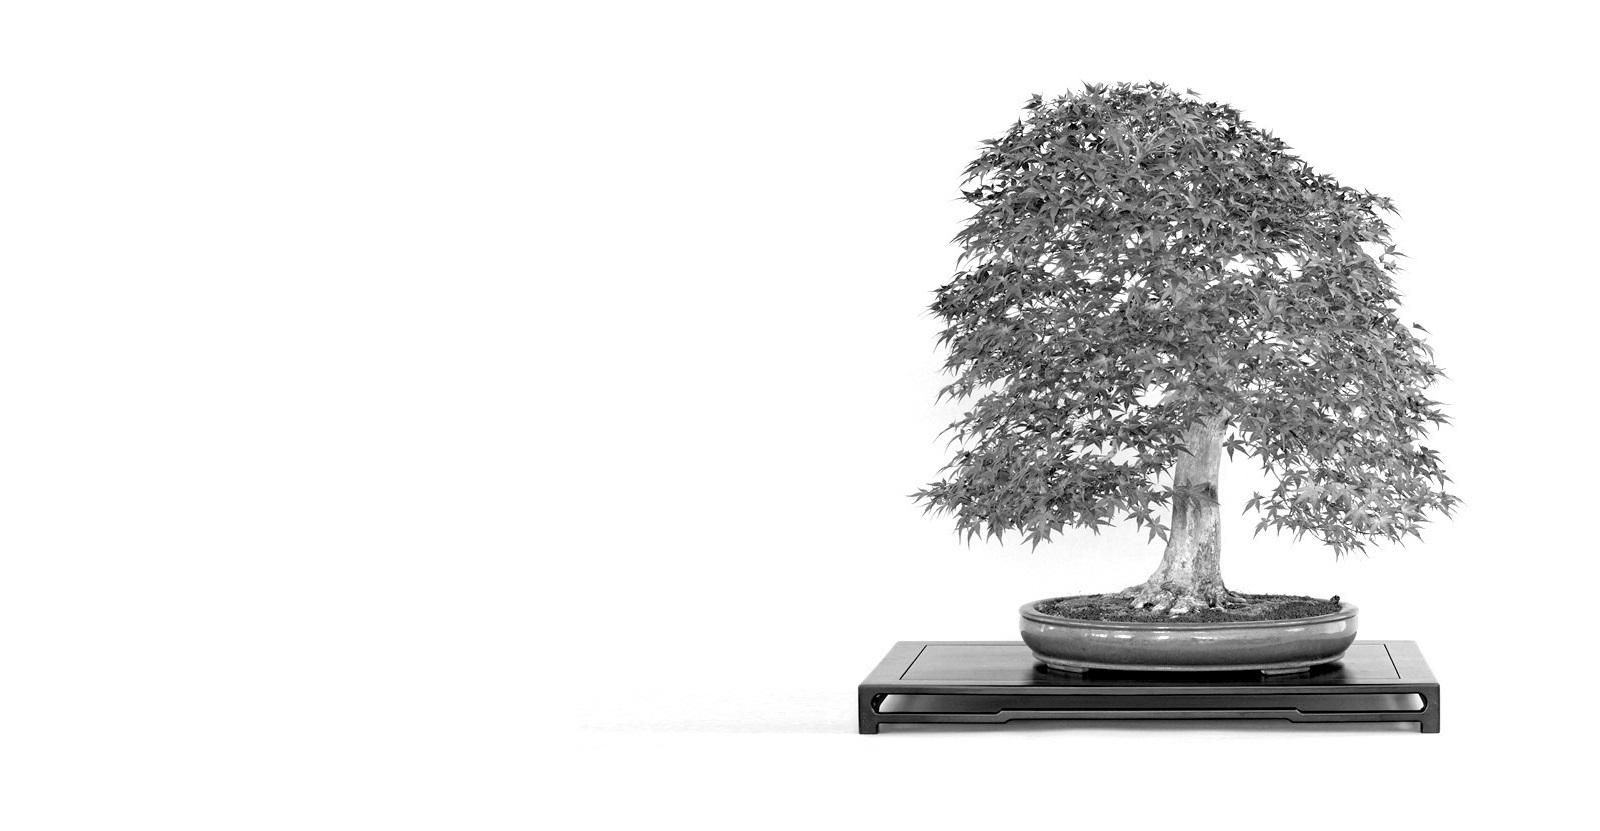 japan juhar bonsai acer palmatum trident mapple bonsai a marczka bonsai kerteszet gyujtemenyebol